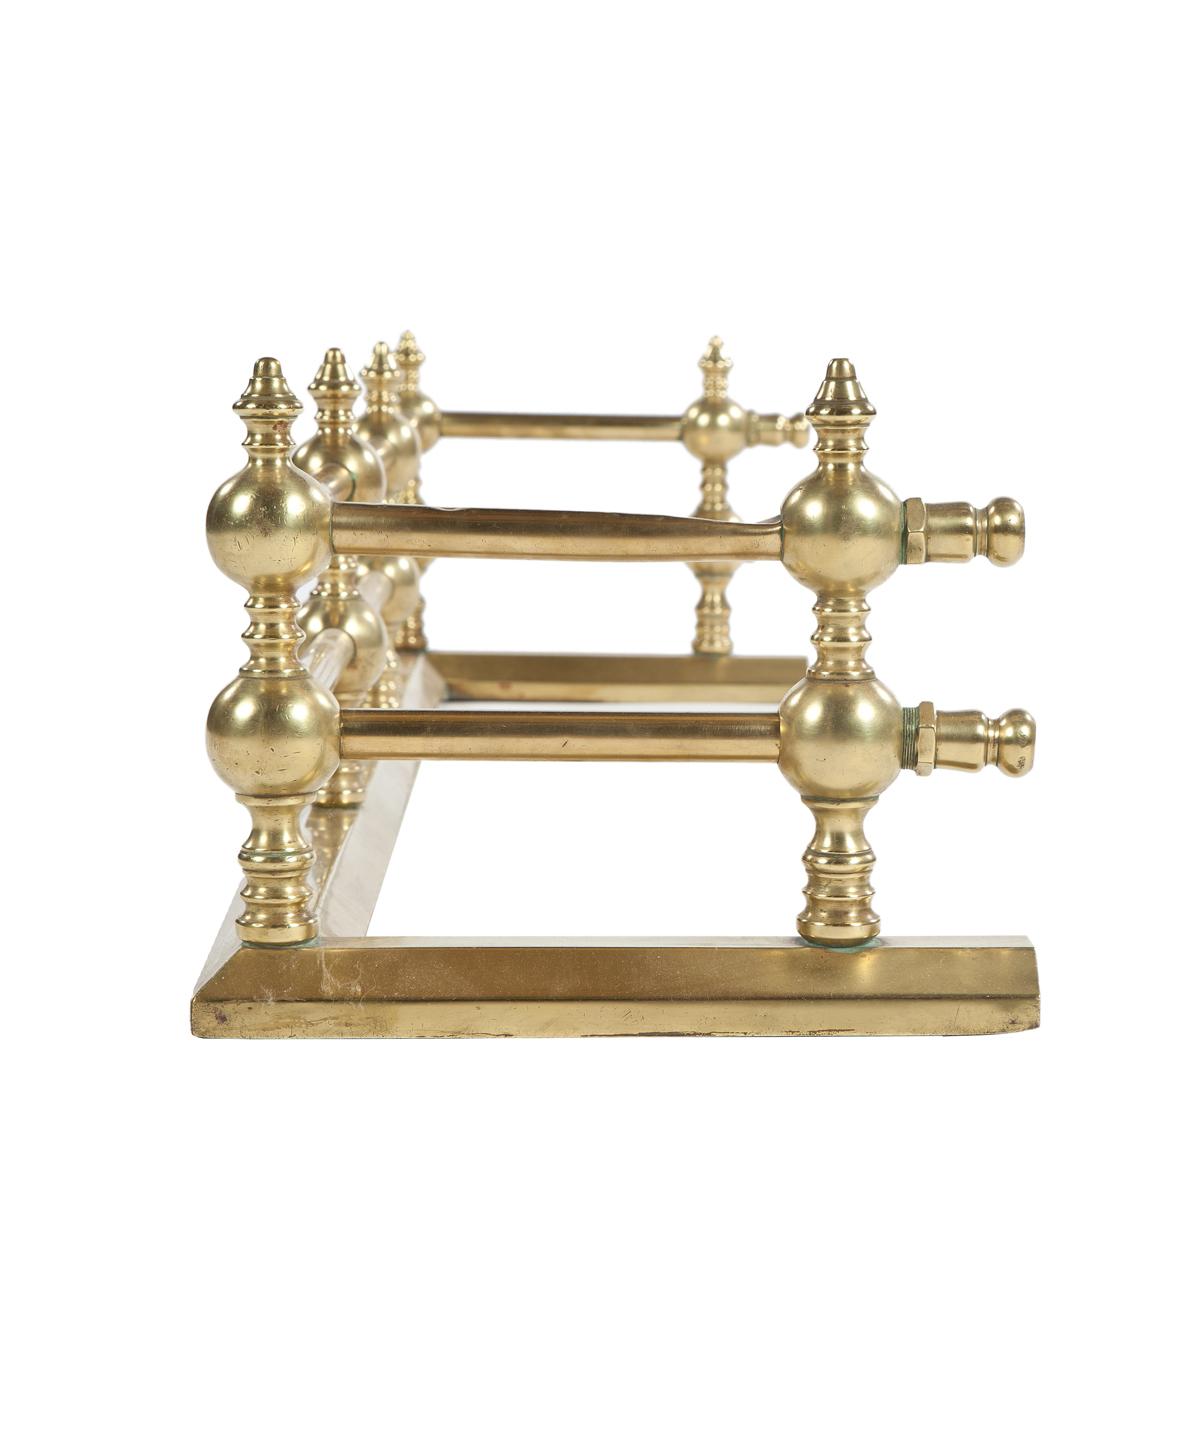 Remarkable Brass Fireplace Fender Download Free Architecture Designs Scobabritishbridgeorg